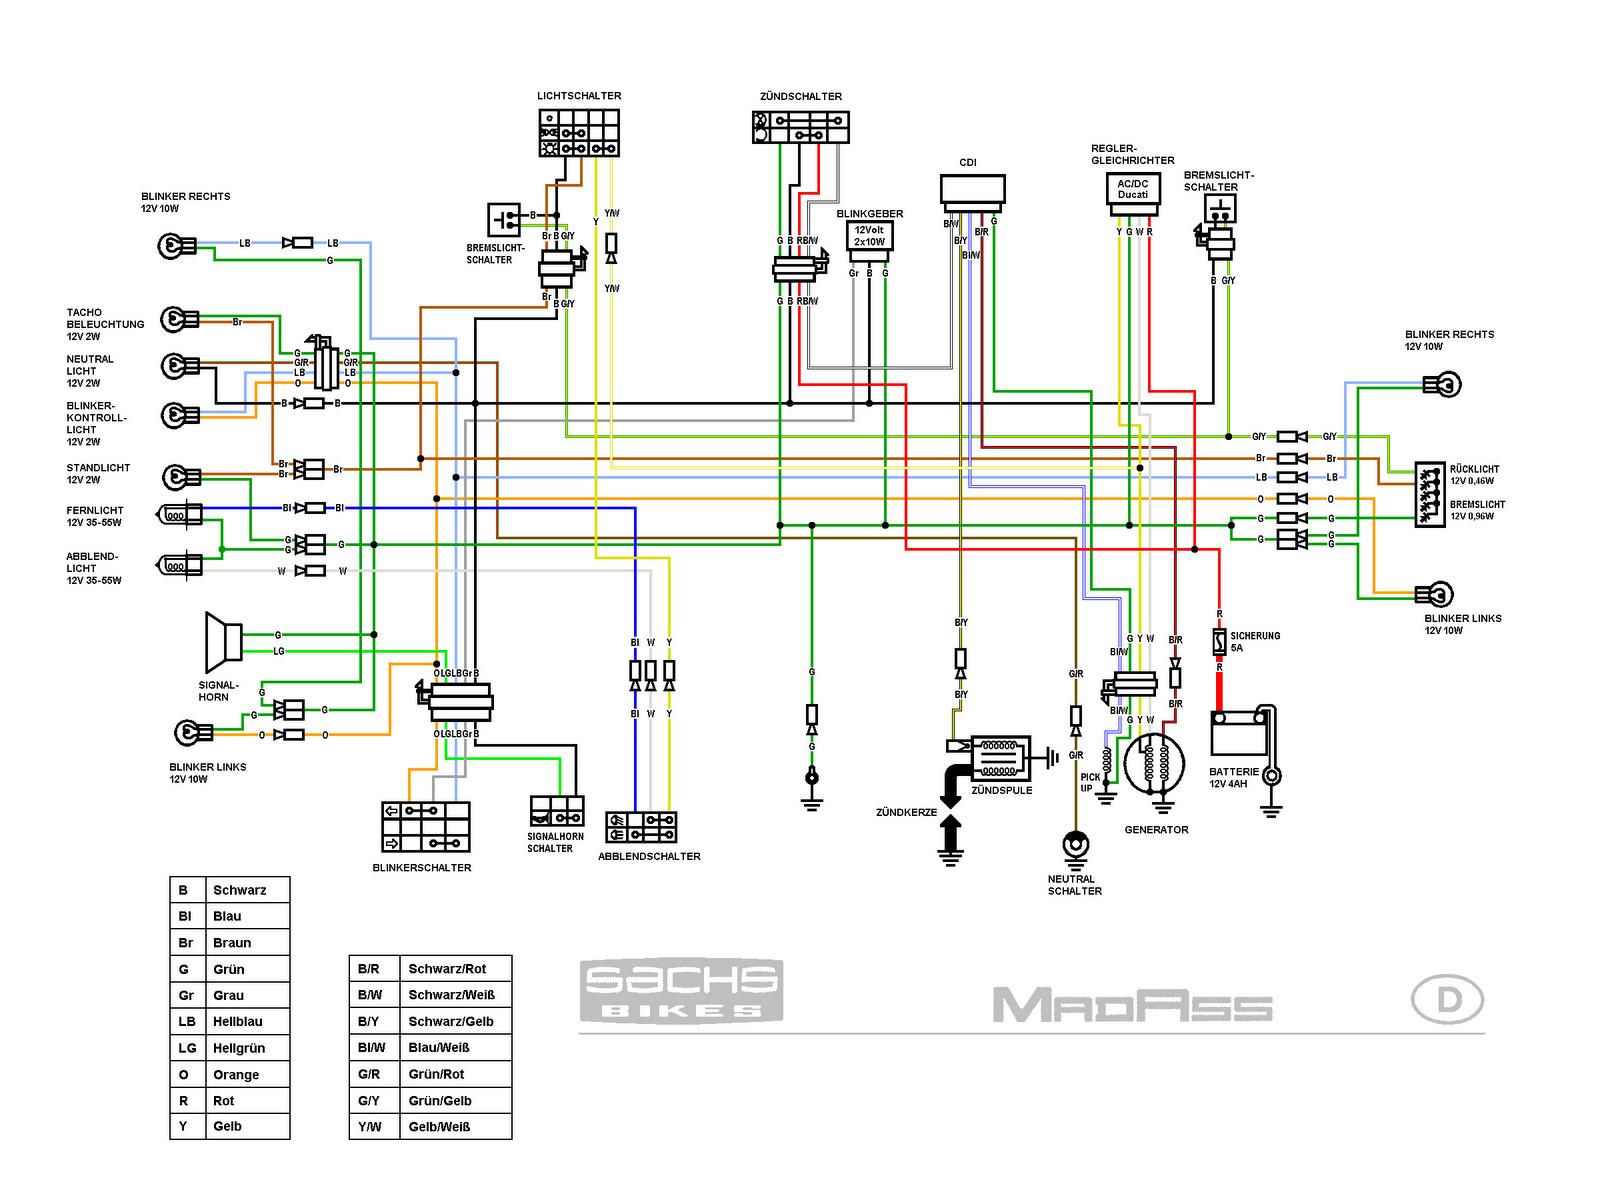 Xrm 110 Wiring Diagram Wiring Diagram Yamaha 125zr - Mio I 125 Wiring  Diagram (#523891) - HD Wallpaper & Backgrounds DownloadItl.cat